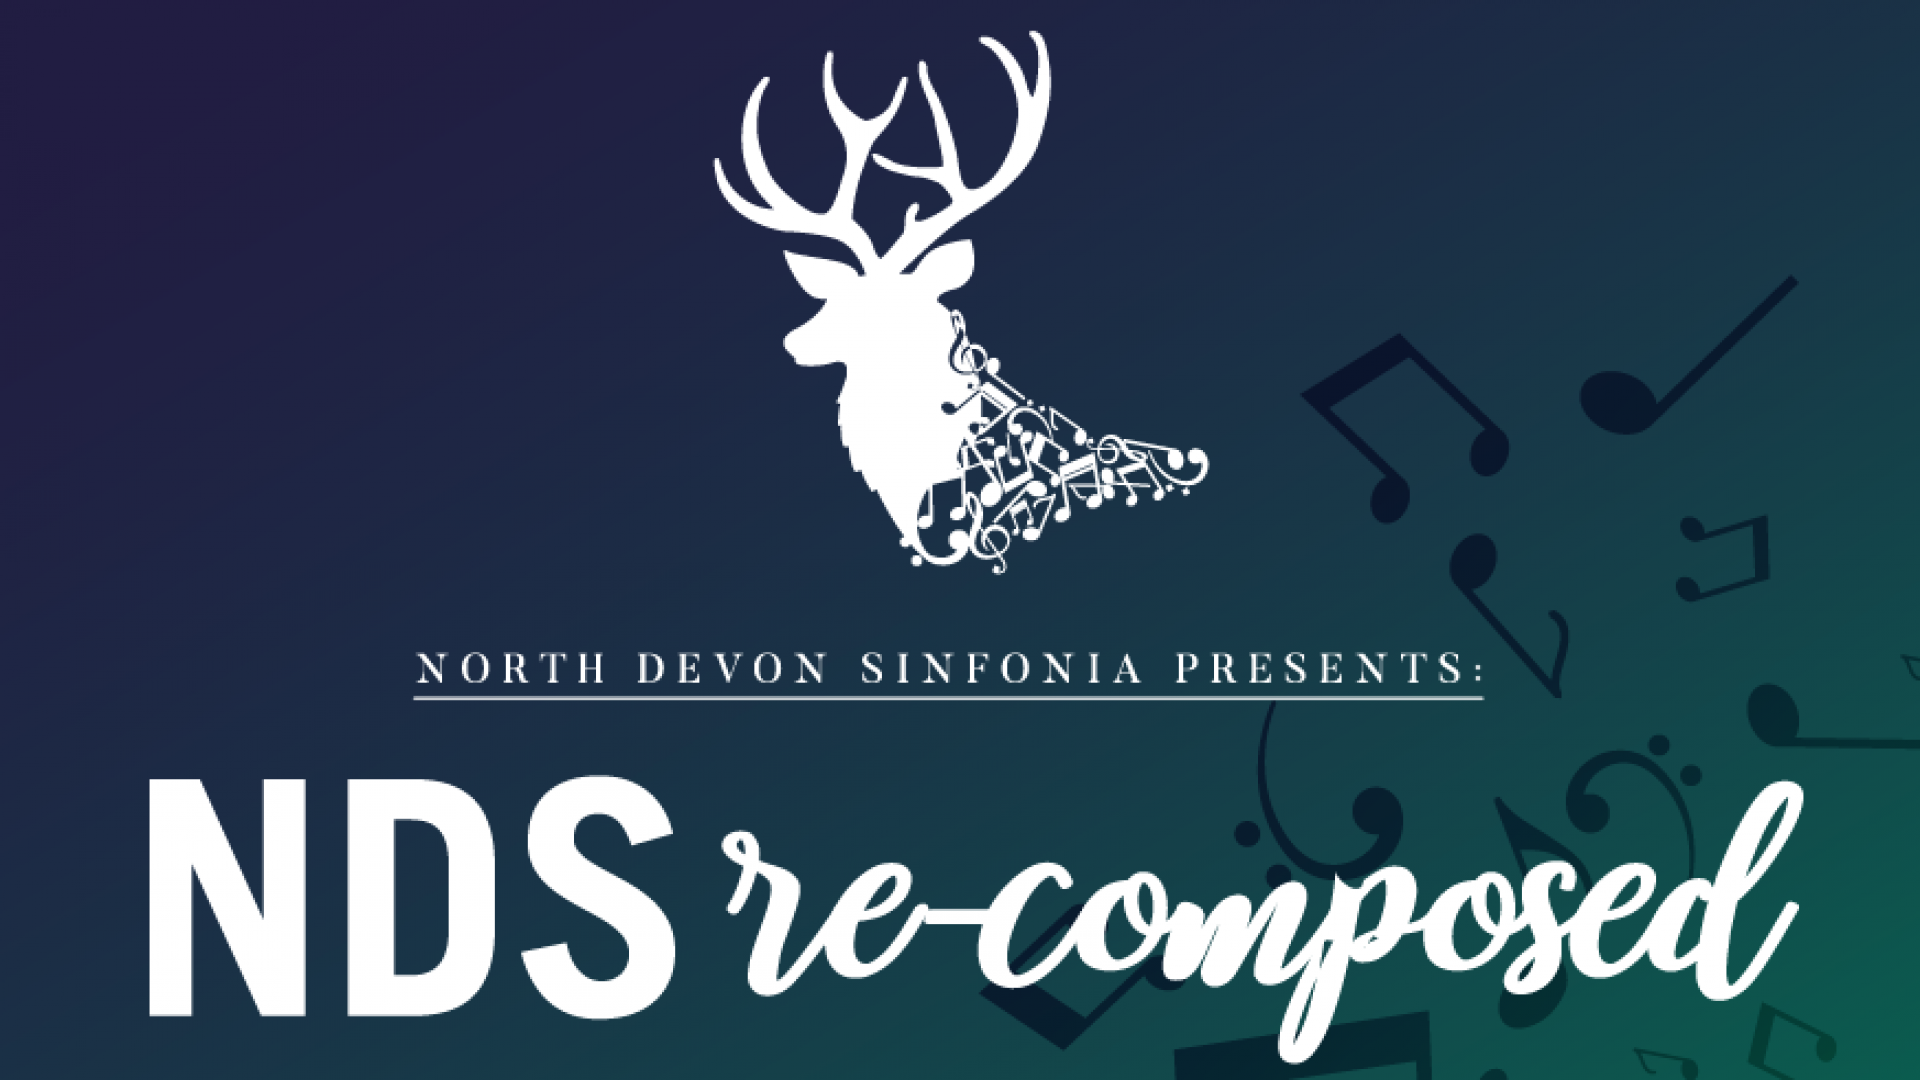 North Devon Sinfonia – Recomposed